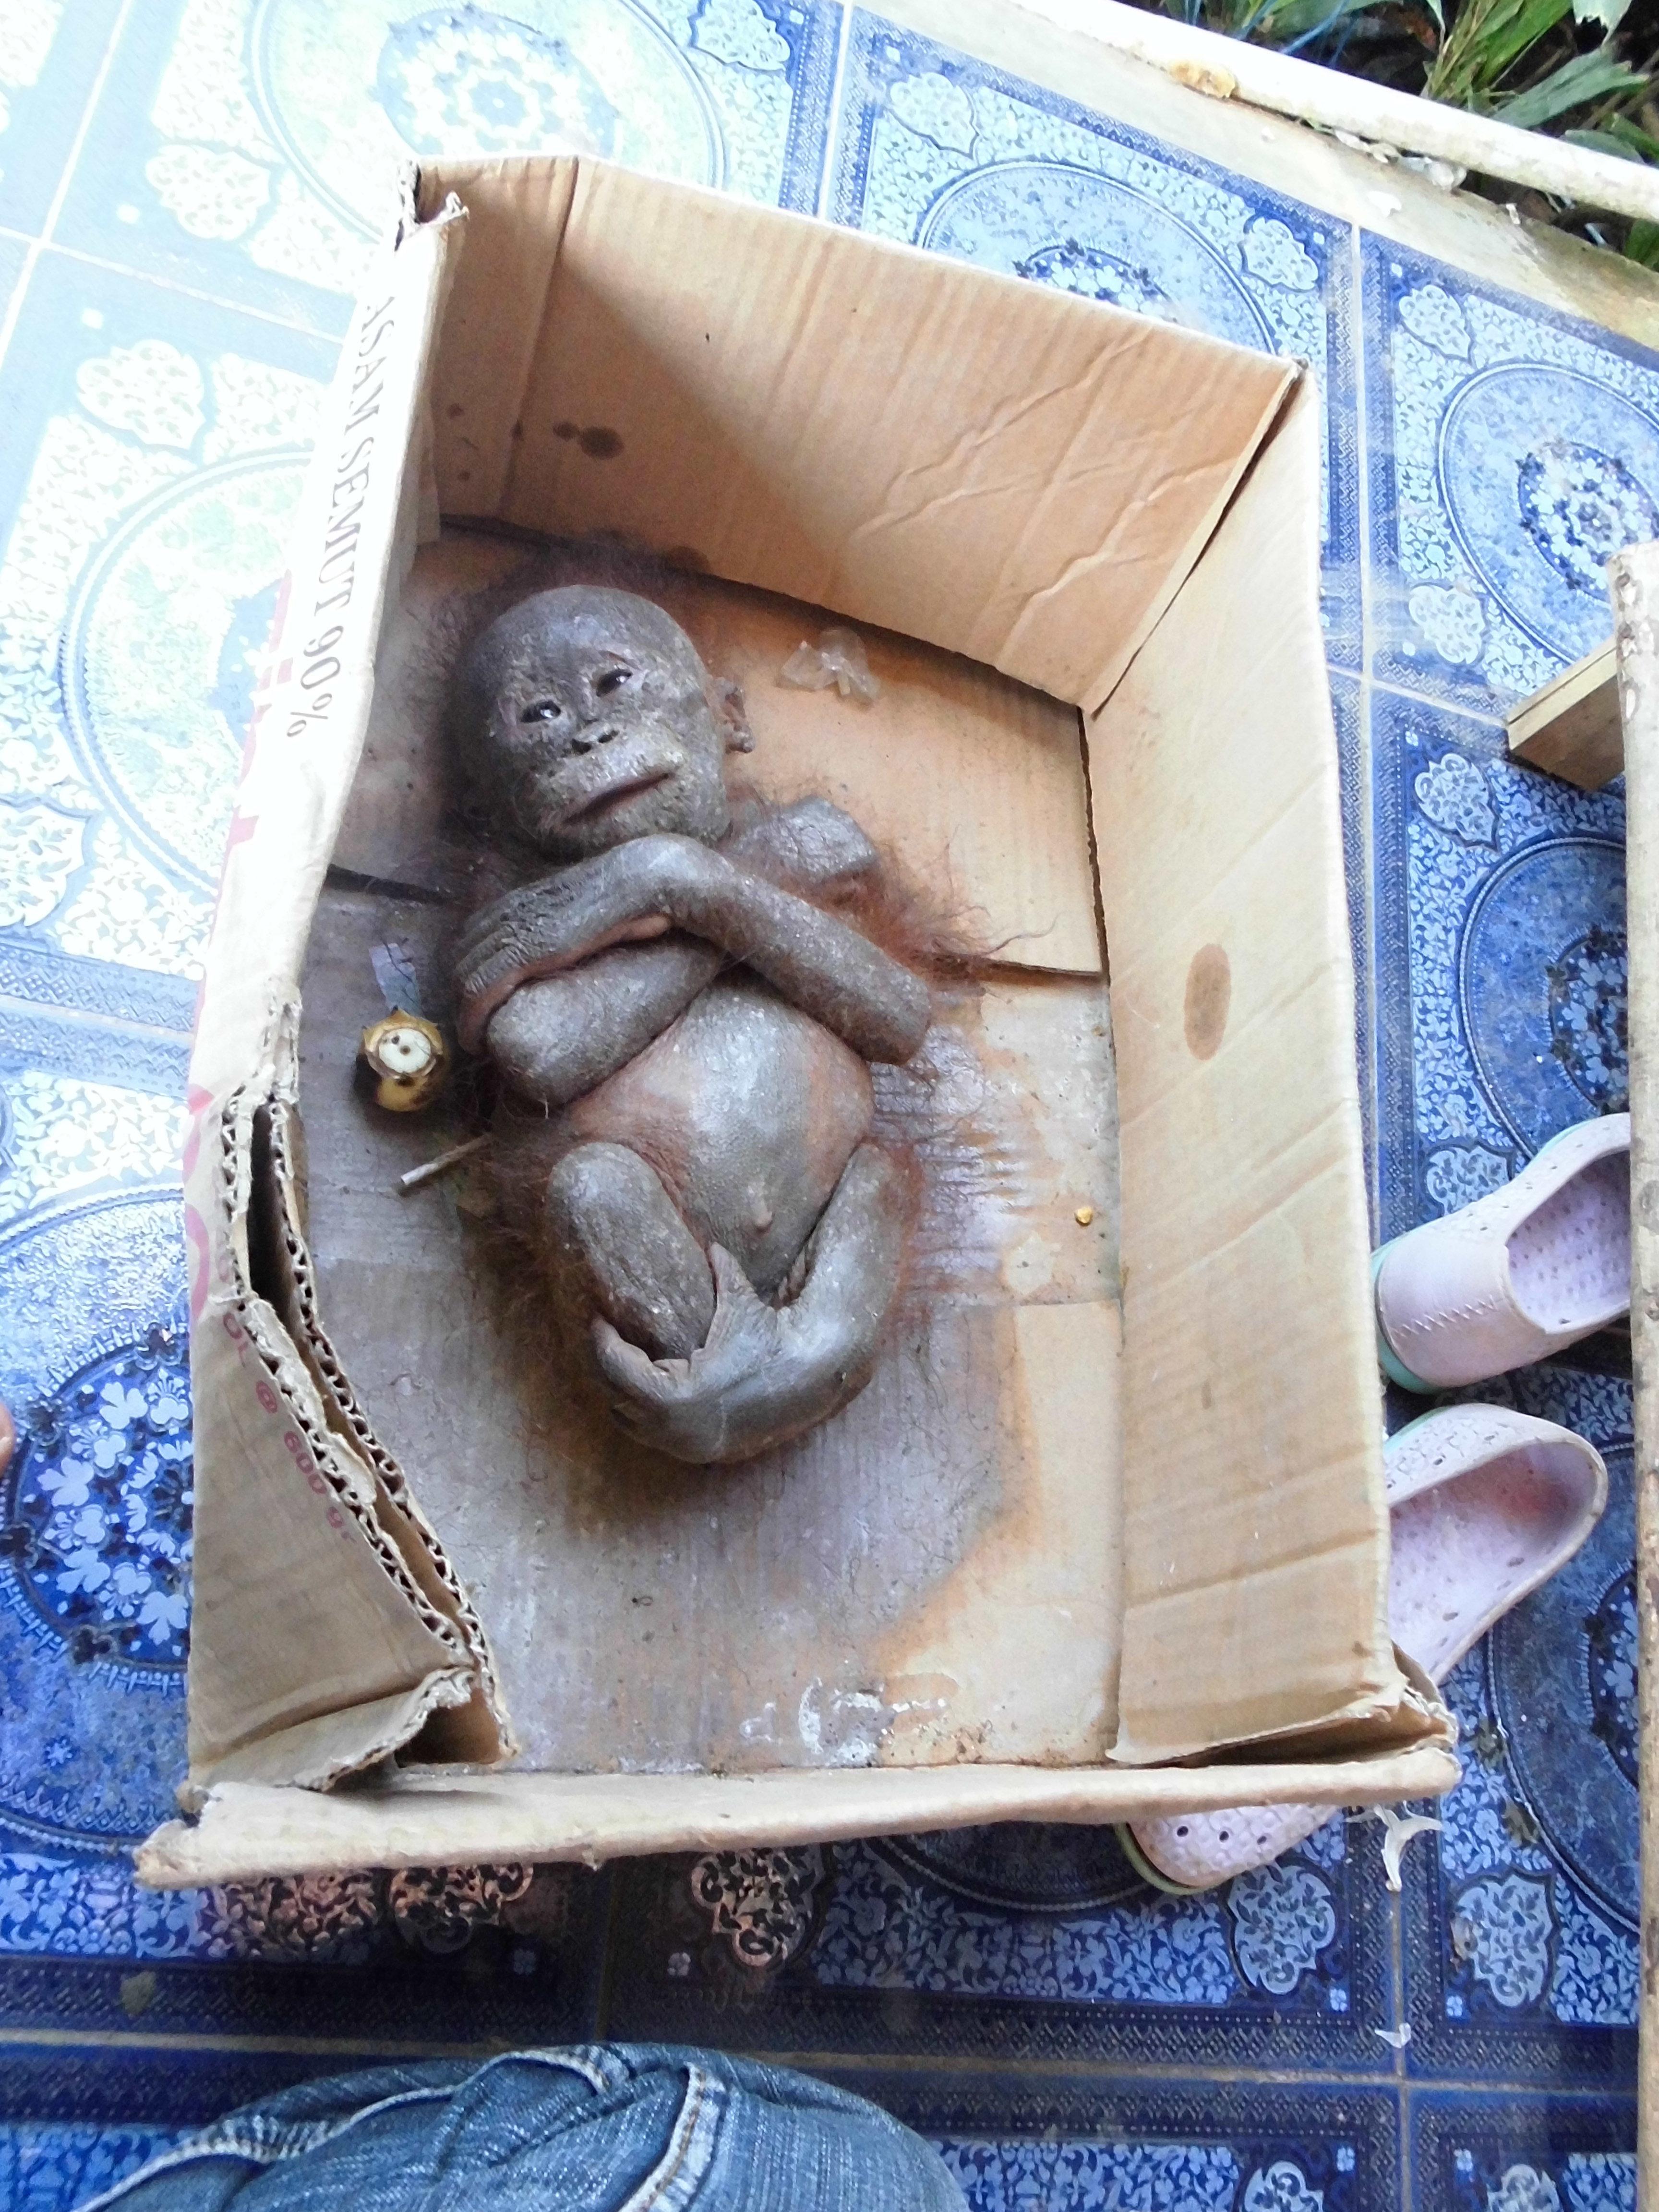 Gito, a three to four month old orangutan was found severely malnourished in a cardboard box in Hamlet Giet, Merawa Village,